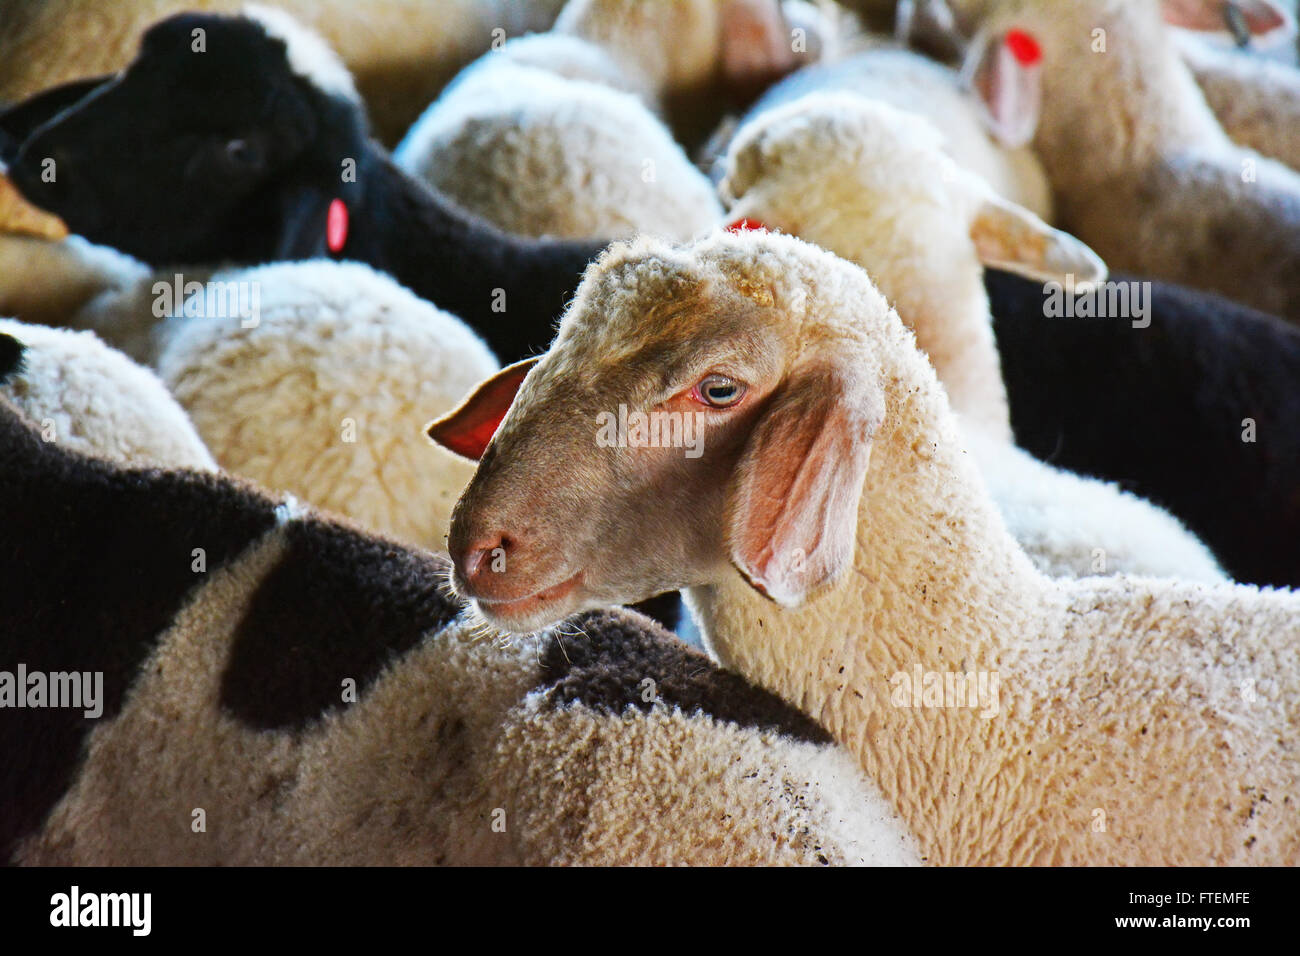 Lambs herd - Stock Image